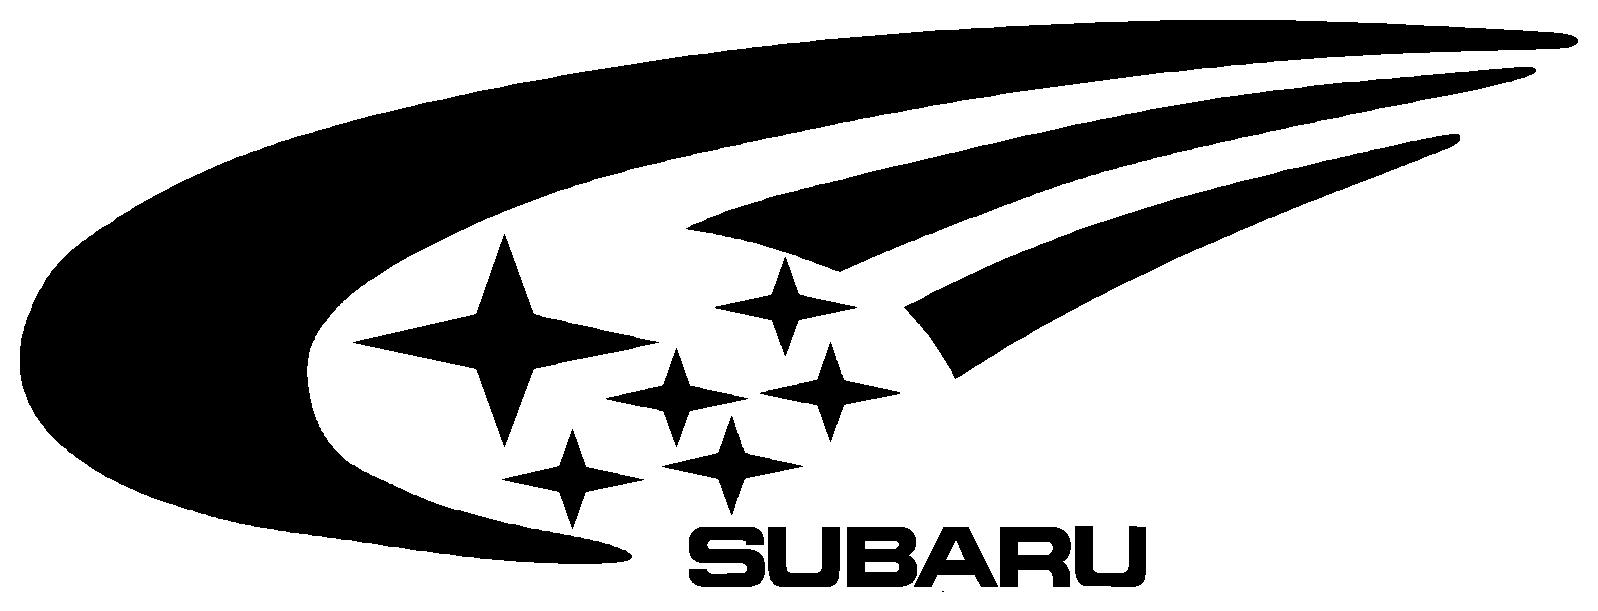 Barbie Logo Font Wallpaper